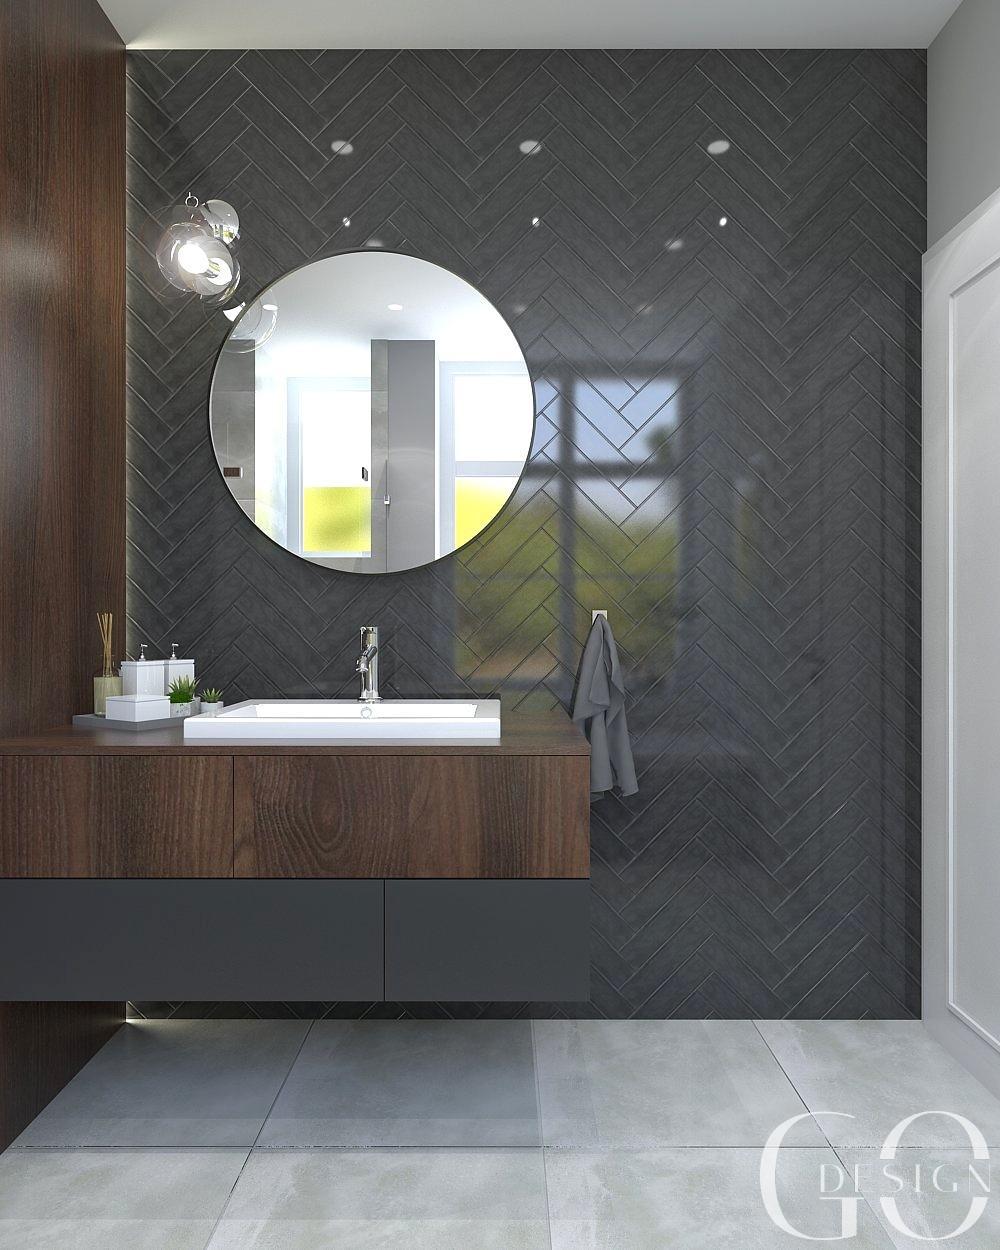 Návrh staromestského bytu v loftovom štýle - Rožňava - Obrázok č. 8